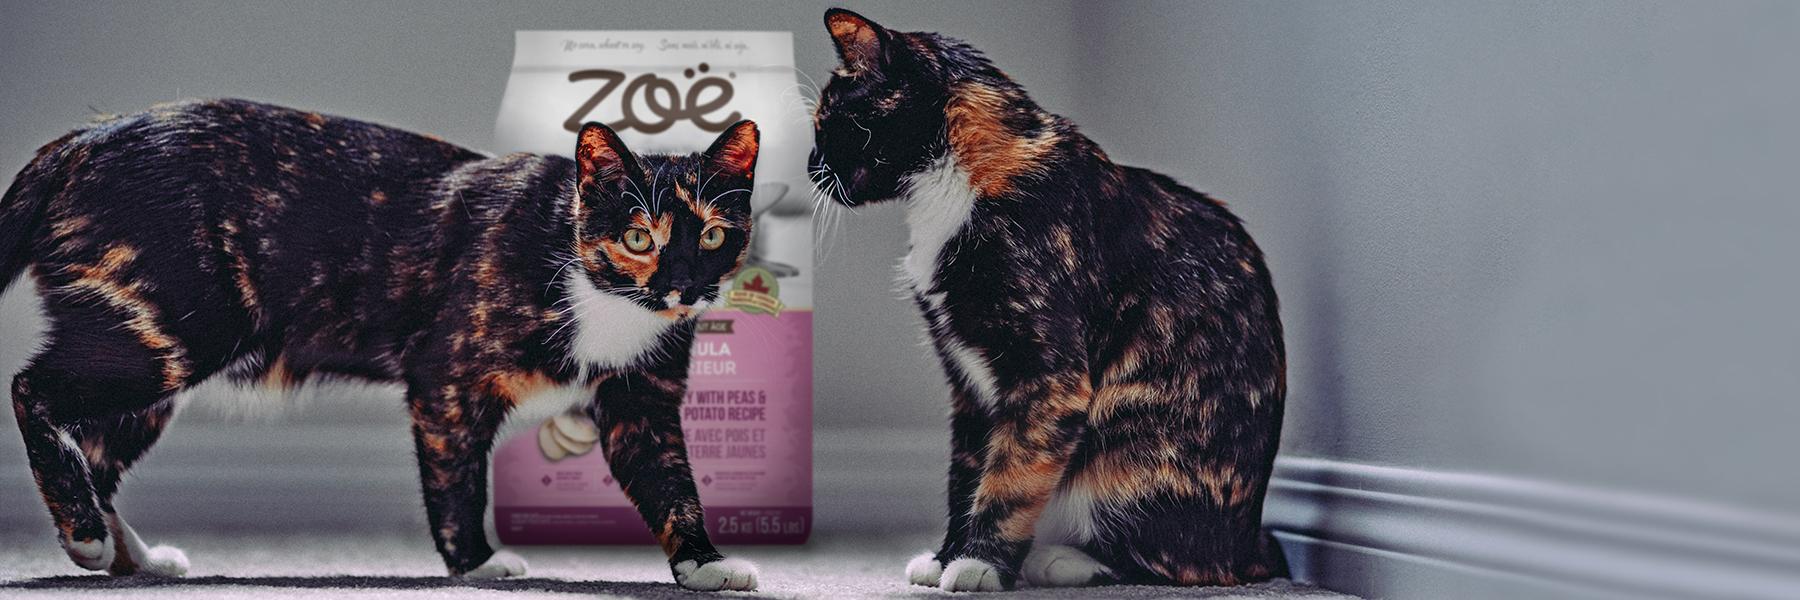 Zoe_Cat_Photo_Edit_Dryfood